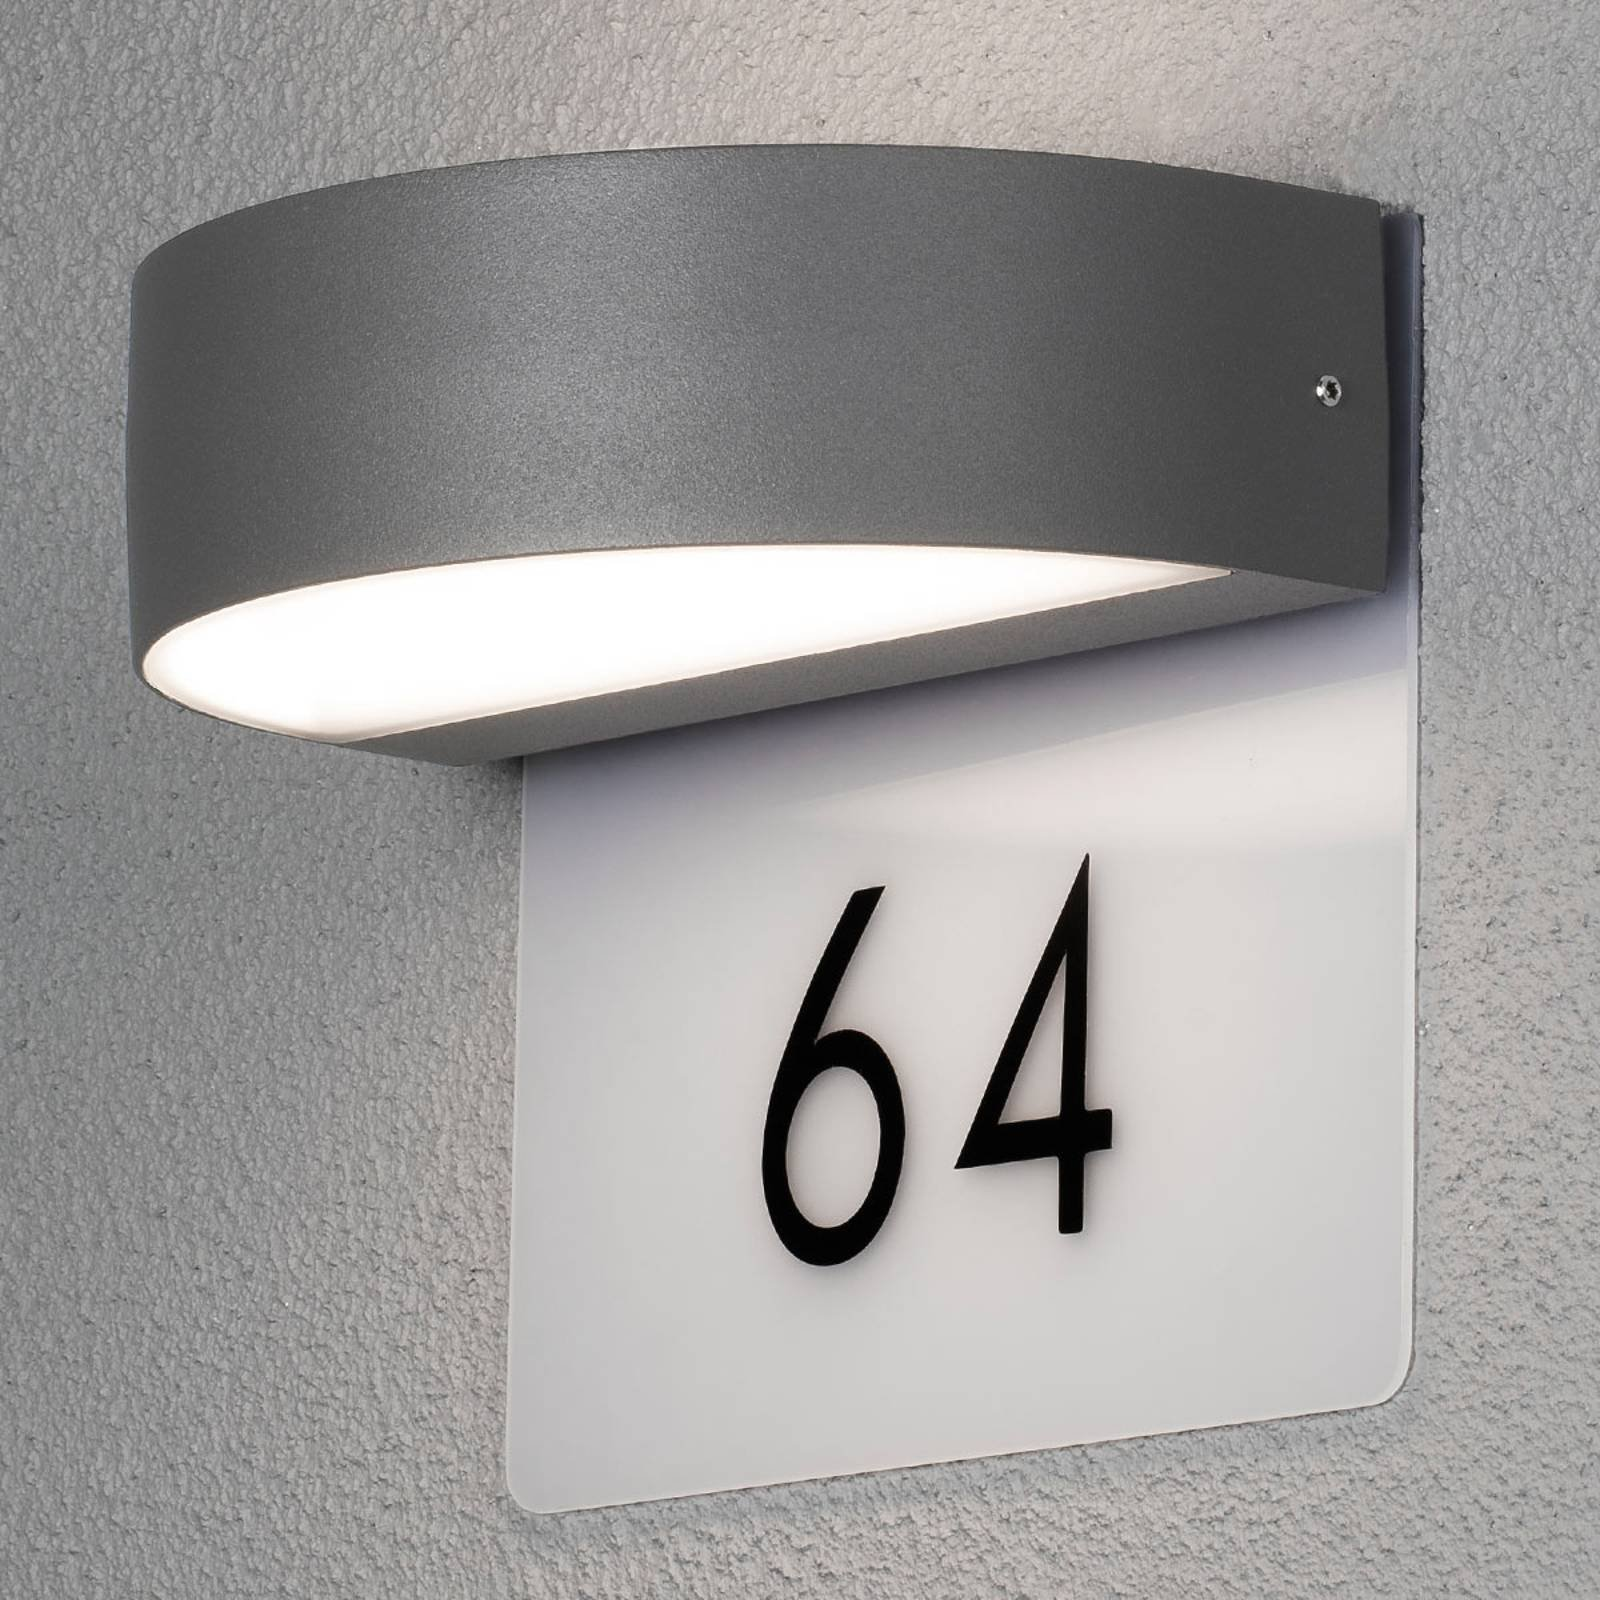 Monza moderne LED-husnummerlampe inkl. sifre